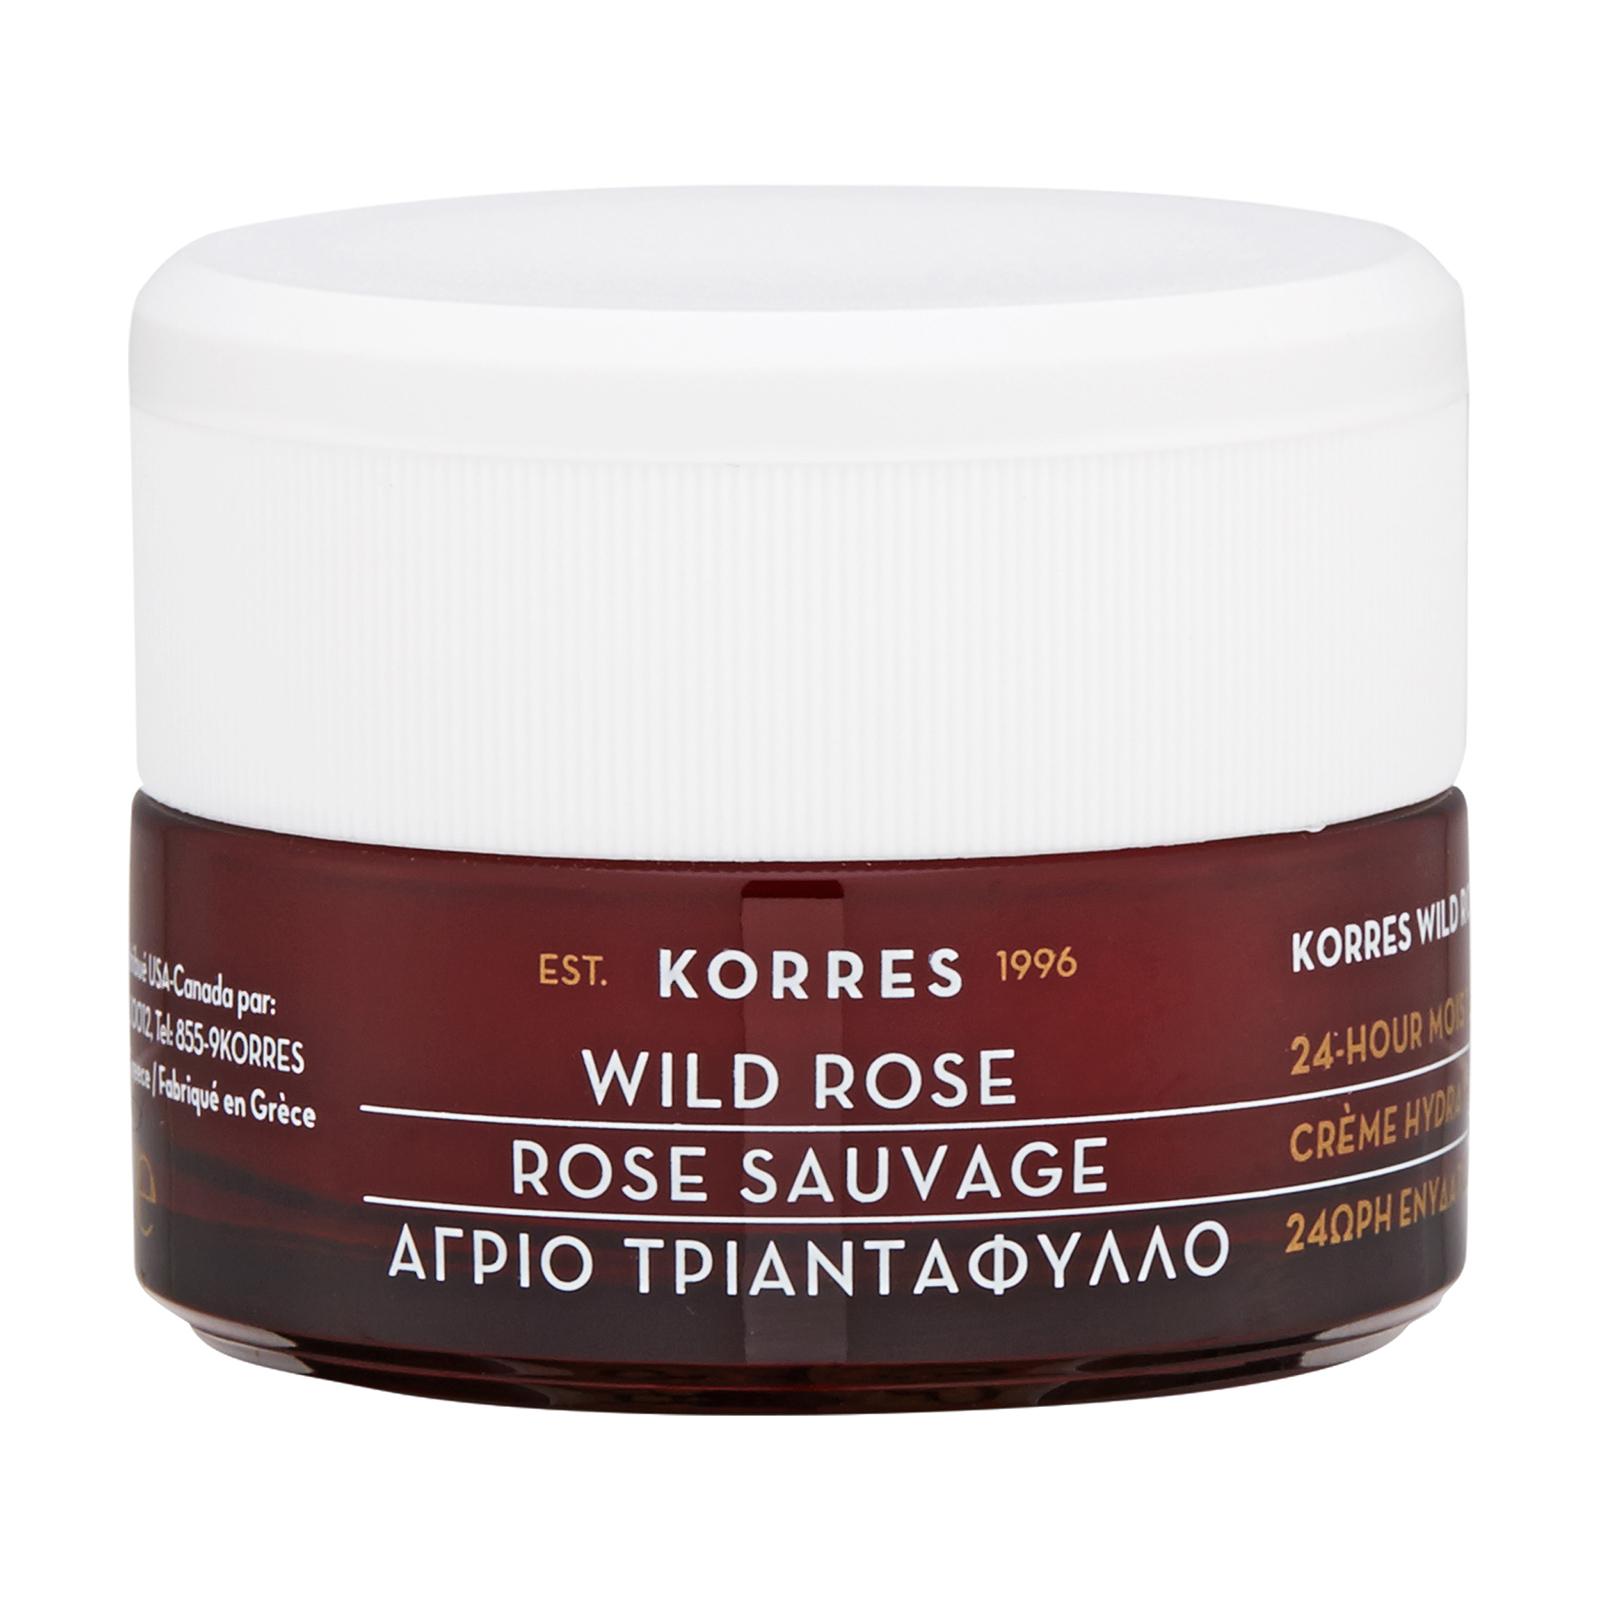 Korres Wild Rose Wild Rose 24-Hours Moisturising & Brightening Cream (For Normal or Dry Skin Types) 1.35oz, 40ml